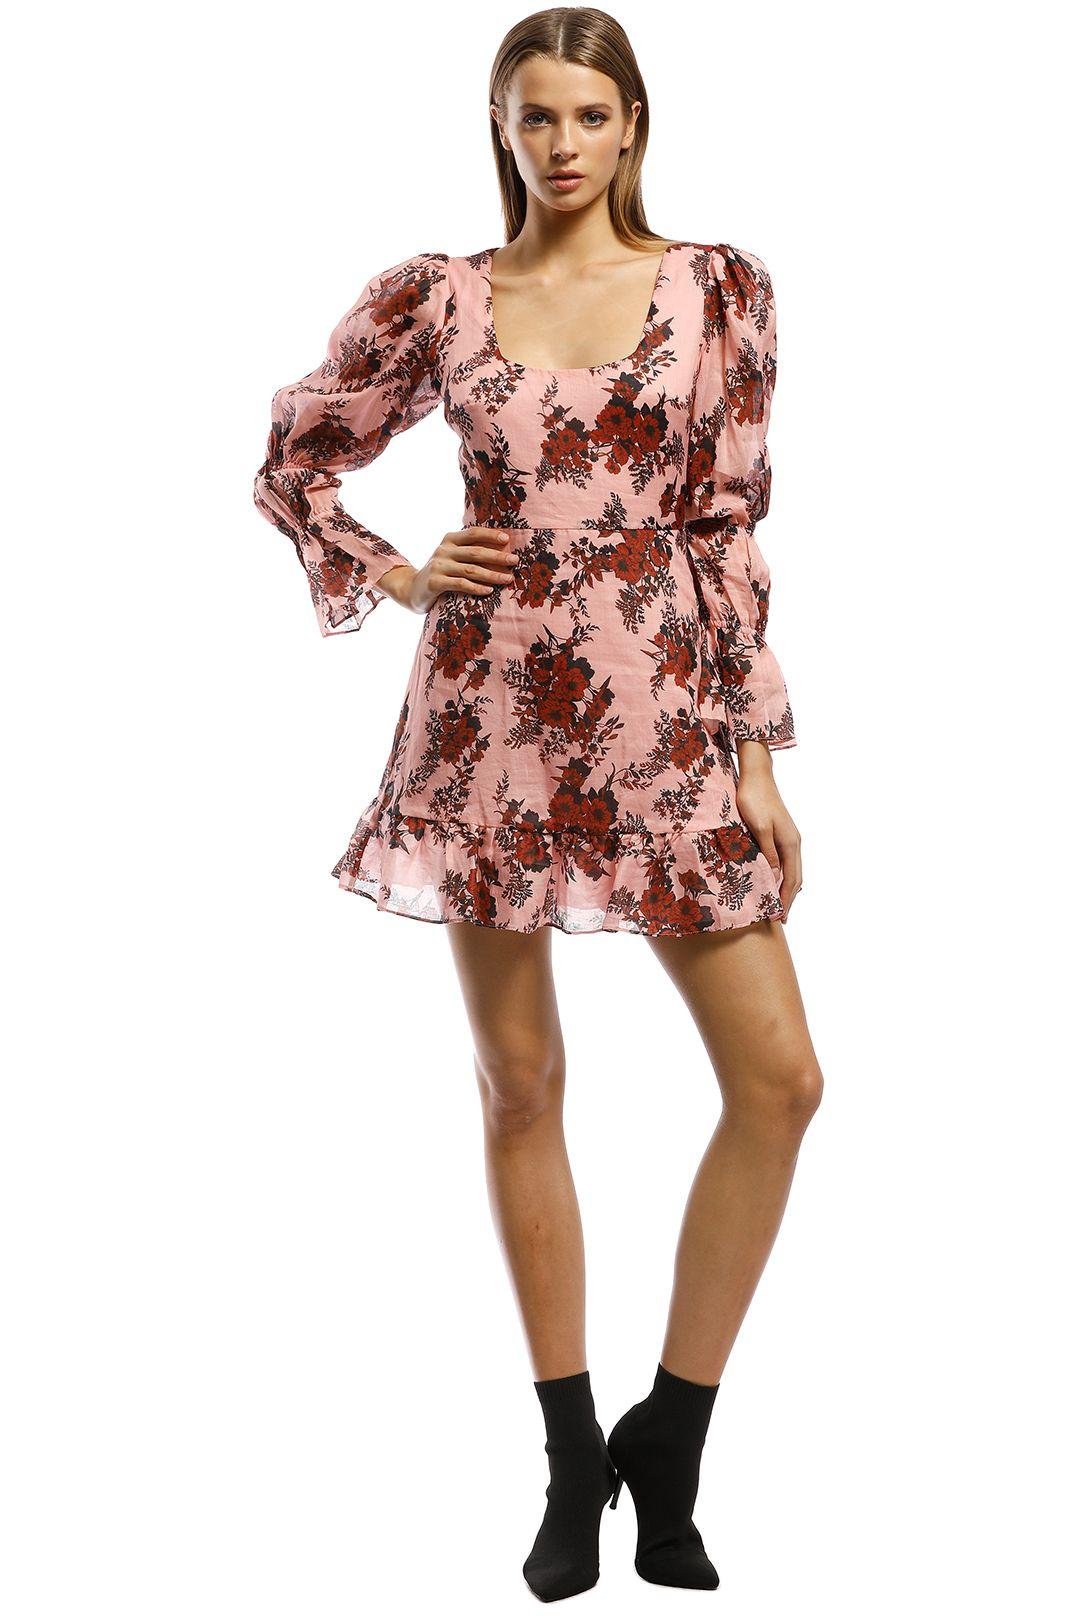 Talulah-Take A Chance LS Mini Dress-Pink-Front